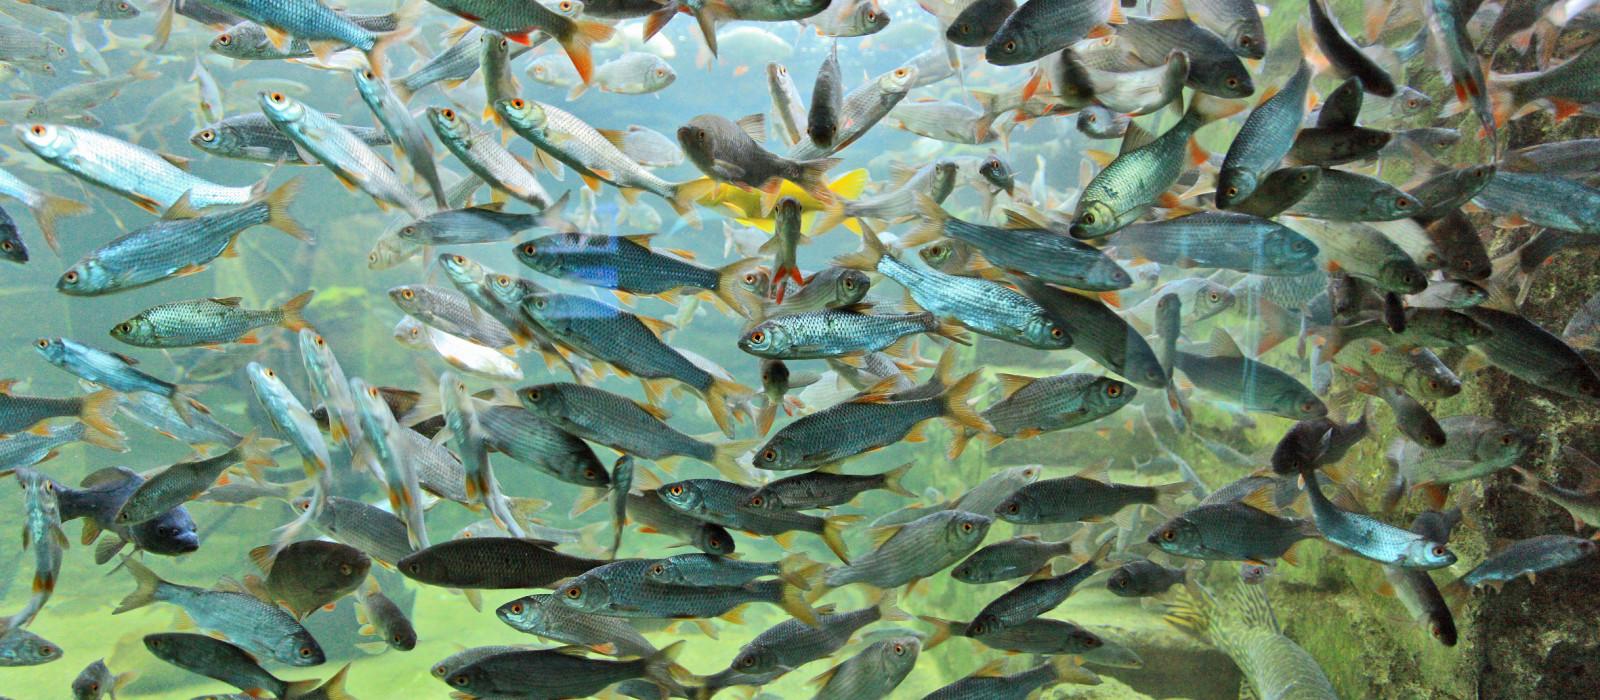 Parc aquarium du Périgord Noir